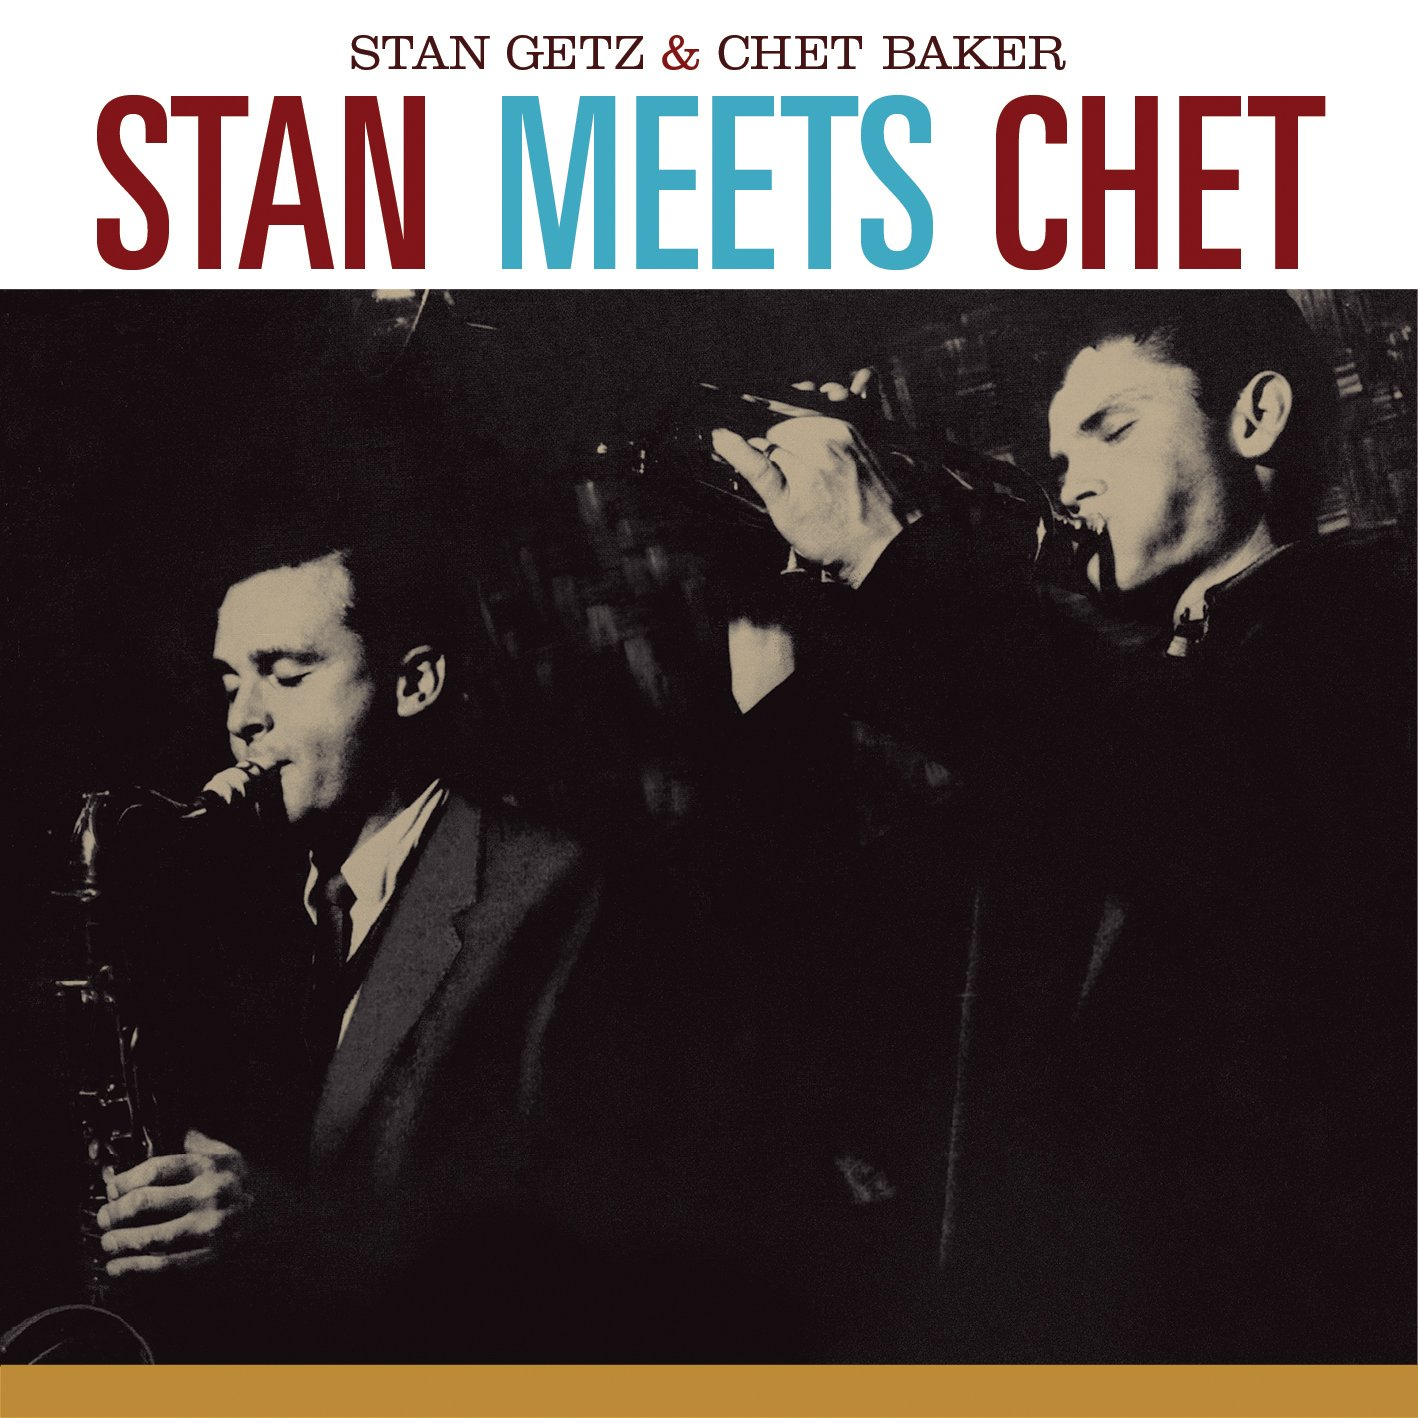 Stan Getz - Getz Meets Mulligan In Hifi Vol. 2